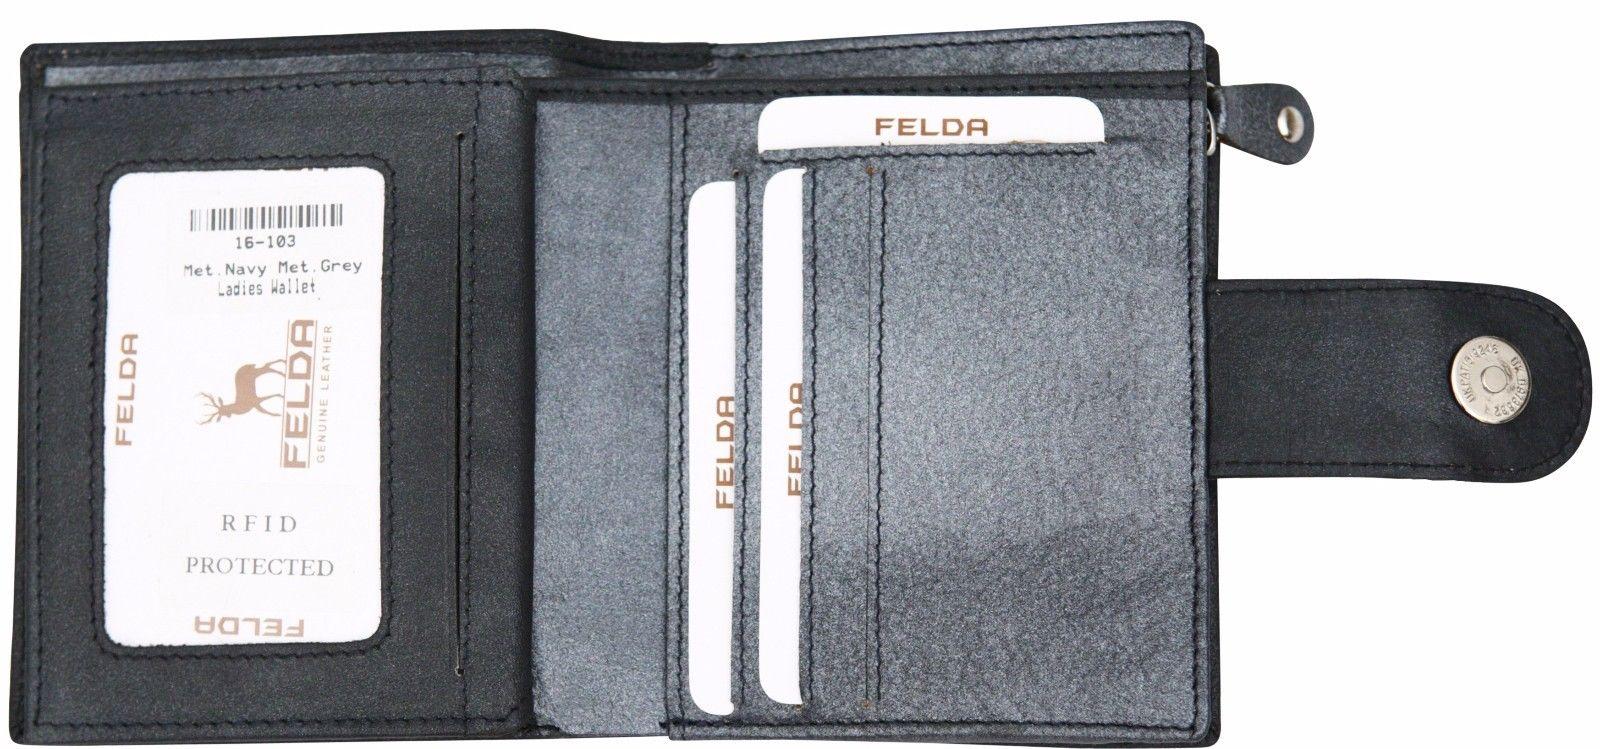 Felda-RFID-onorevoli-MEDAGLIA-amp-Card-Purse-Wallet-Genuine-Leather-Multi-SOFT-BOX-REGALO miniatura 51